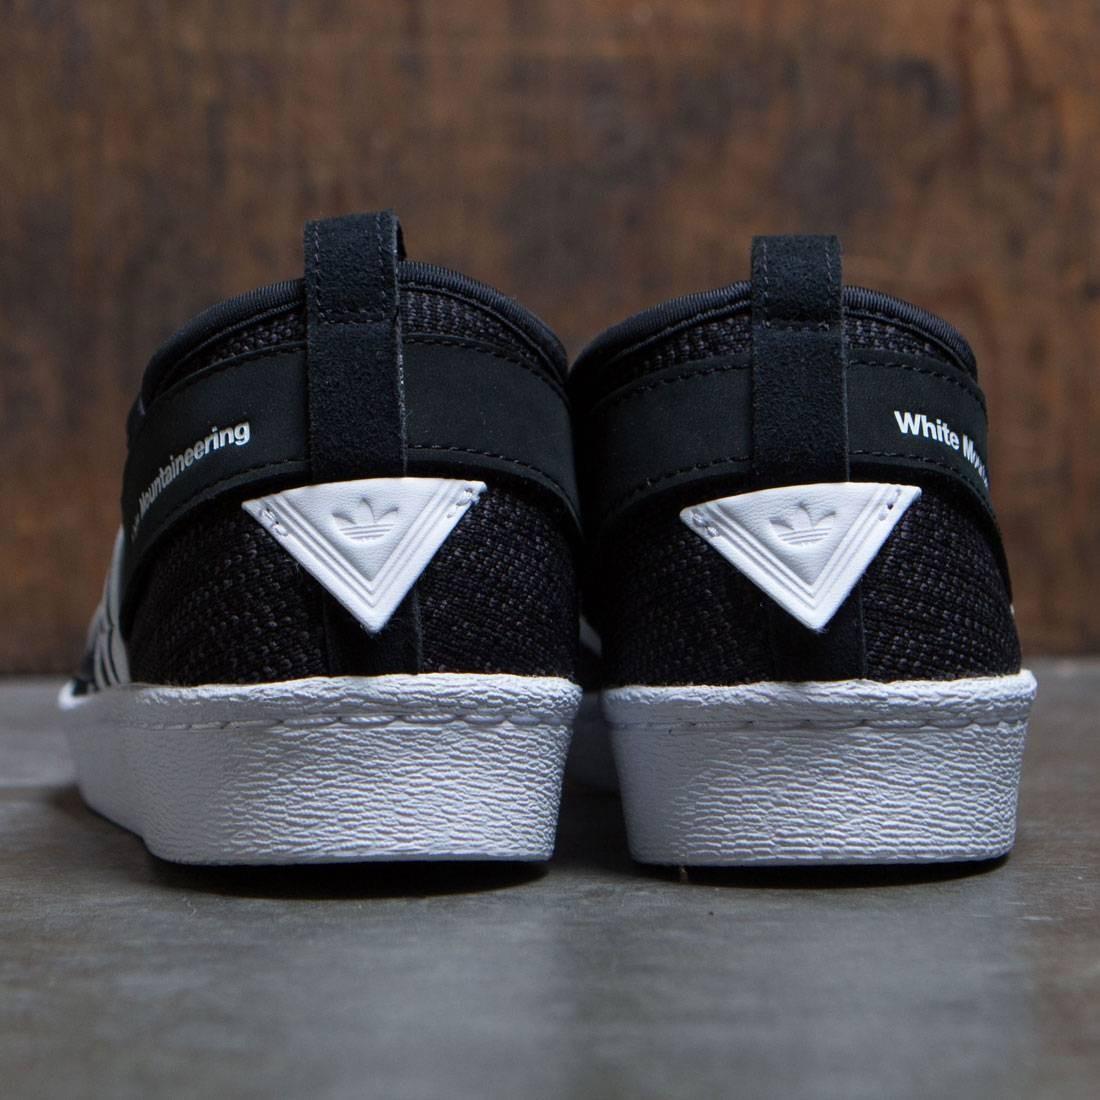 043f7f9abc25 Adidas Men White Mountaineering Superstar Slip-On Primeknit (black   core  black   footwear white)